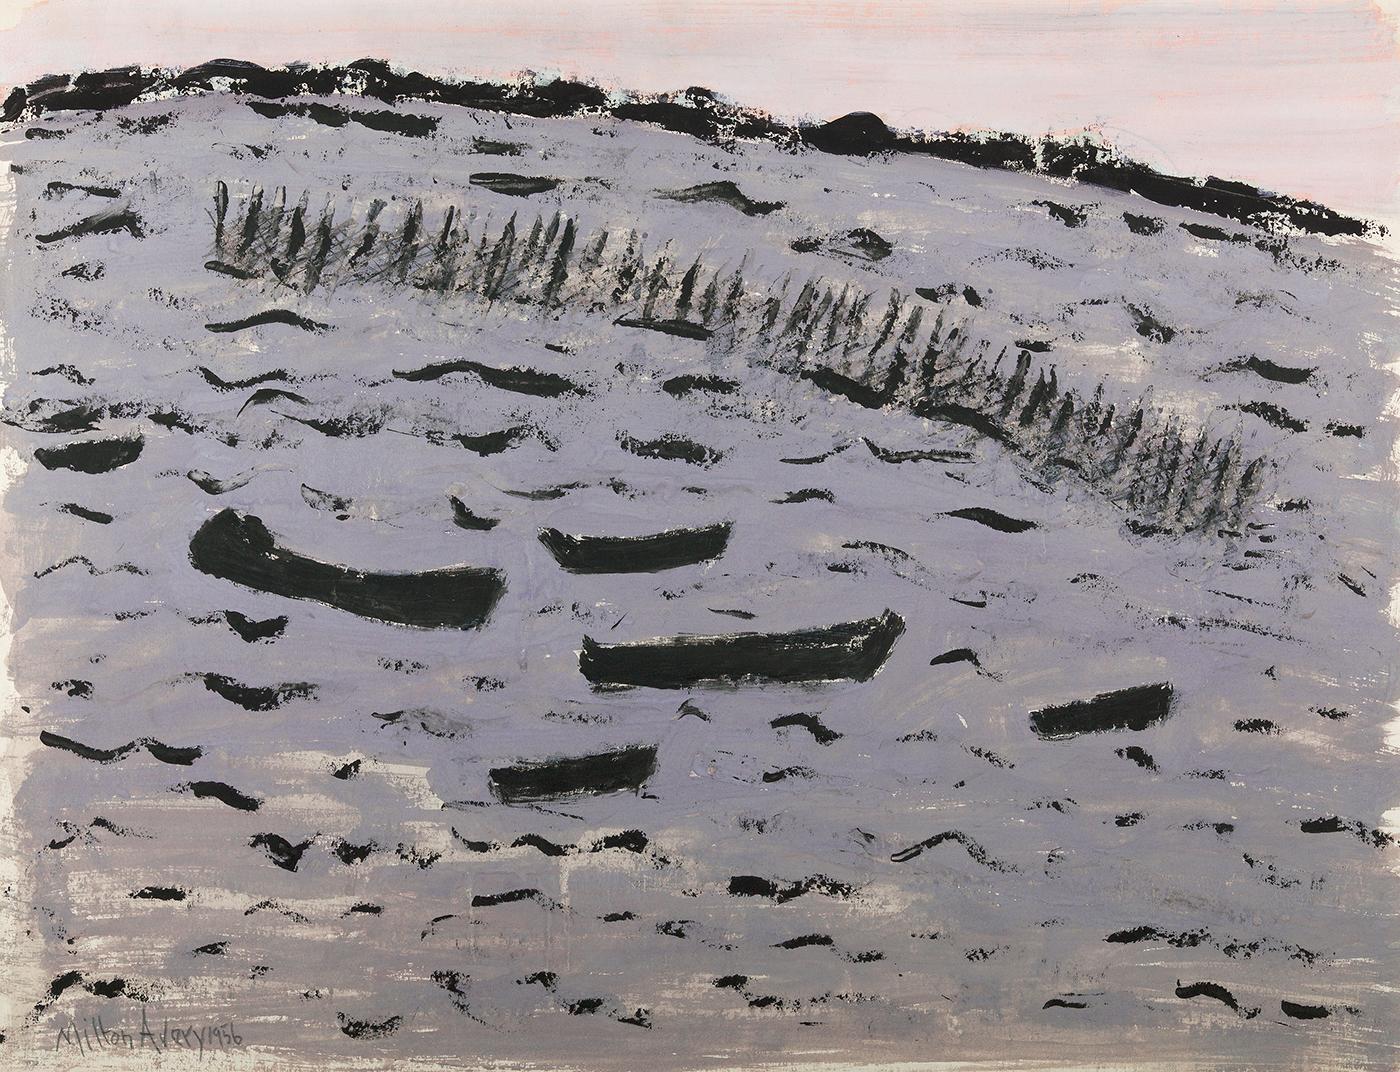 Sunset Harbor (Choppy Bay), 1956